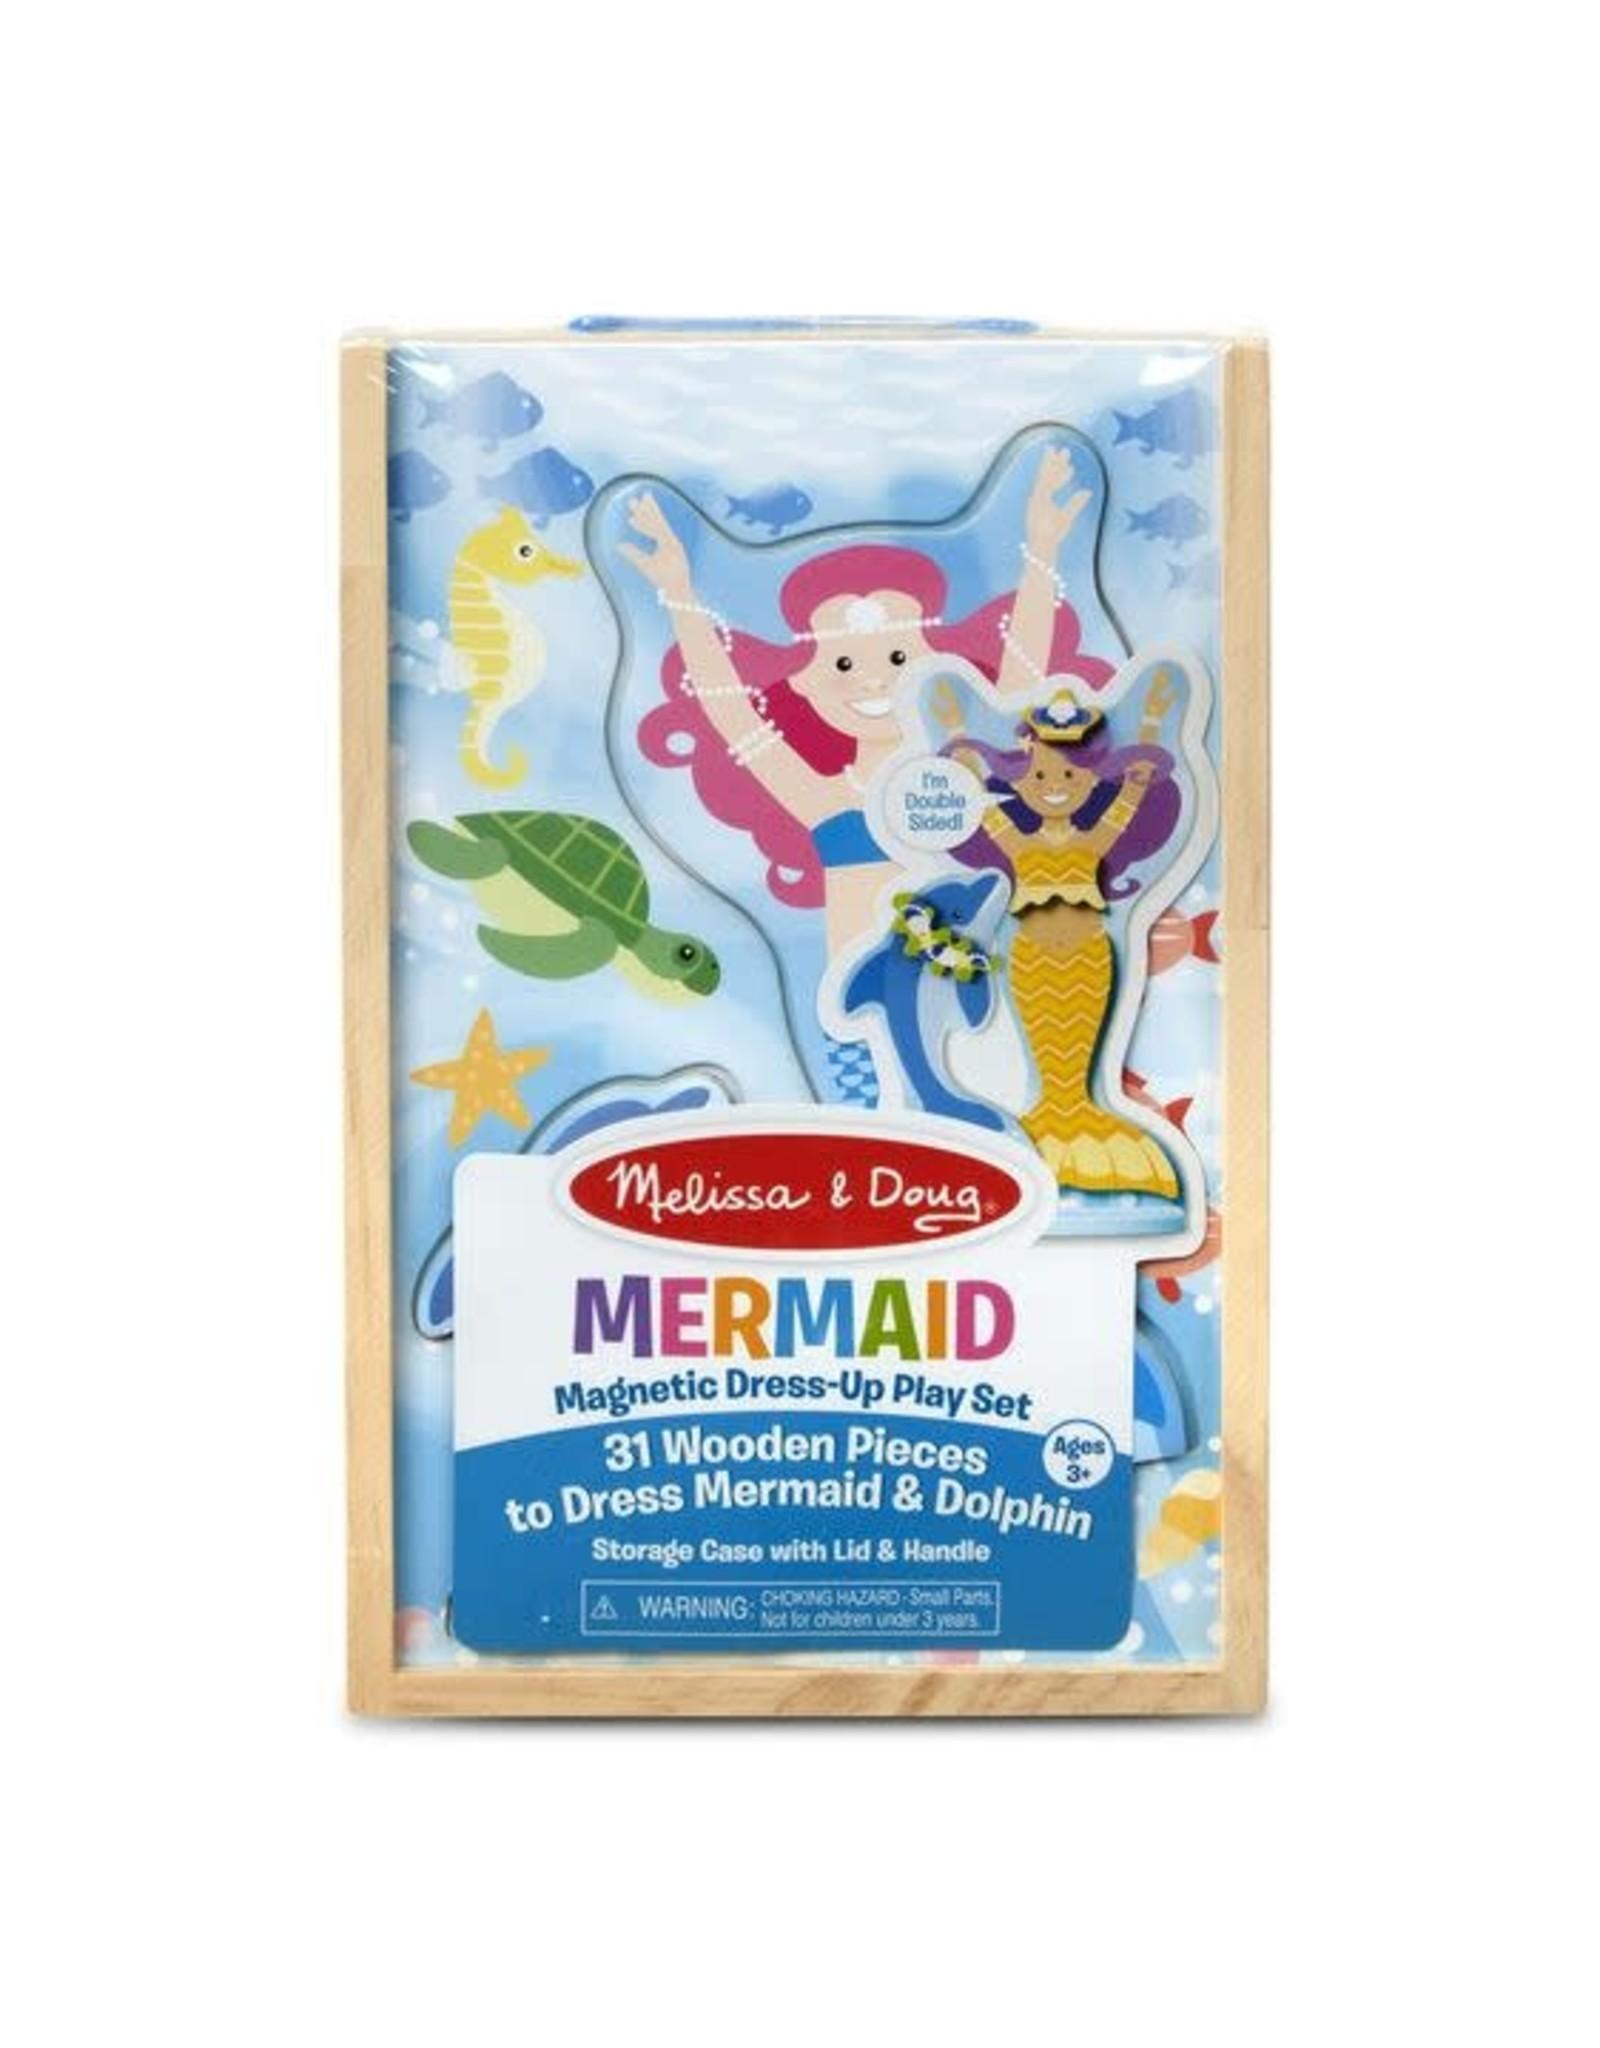 Mermaid Magnetic Dress-Up Play Set